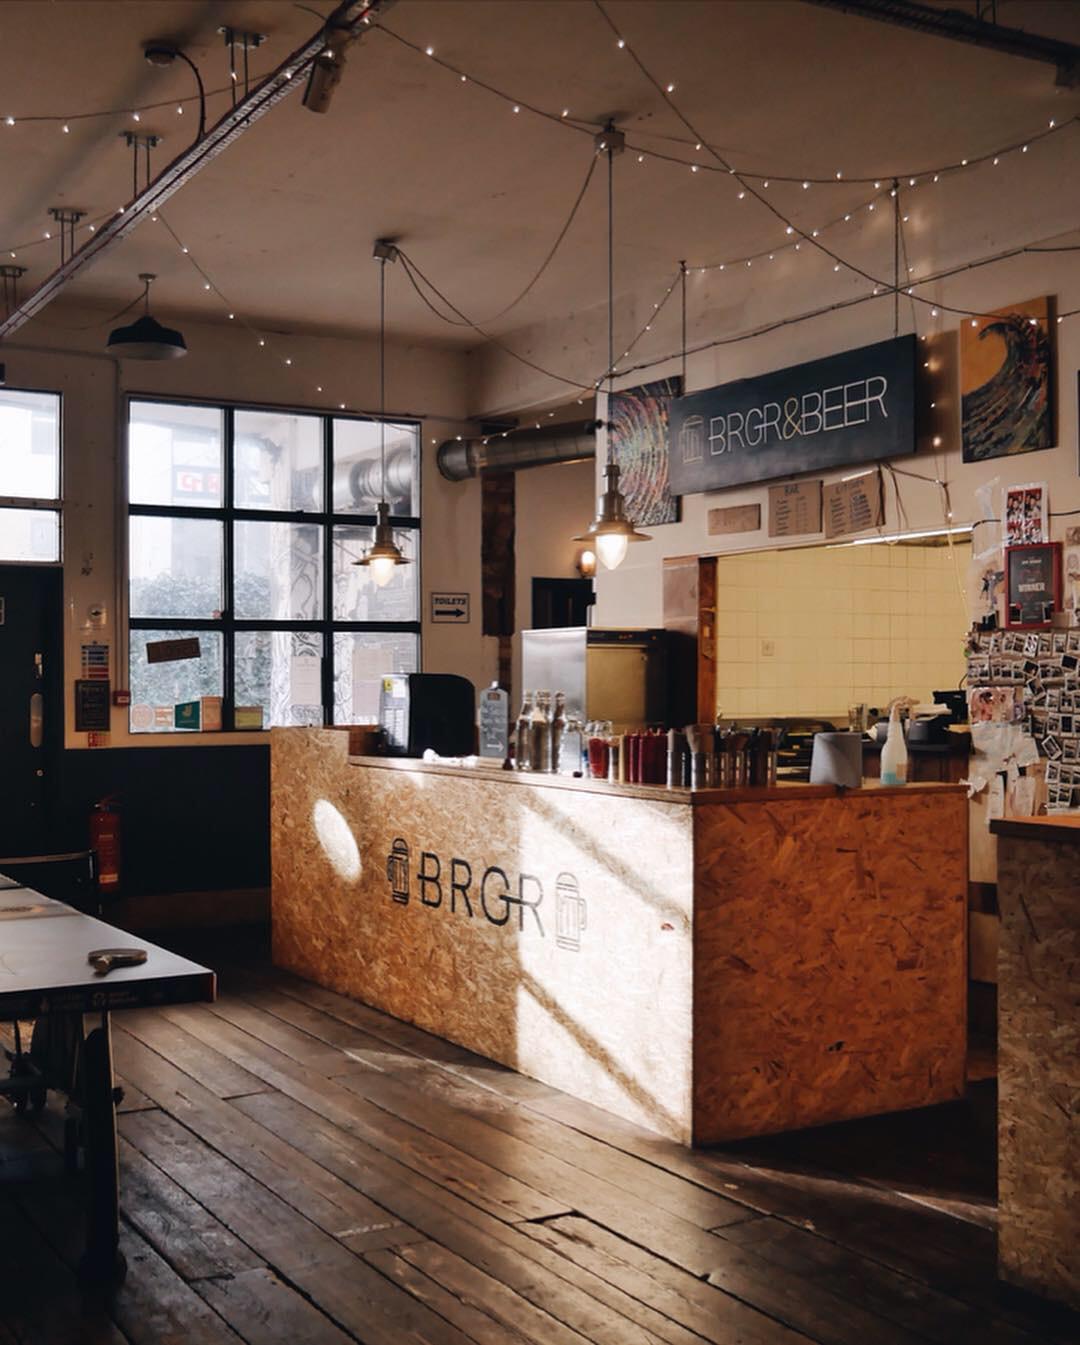 Brgr & Beer, Croydon